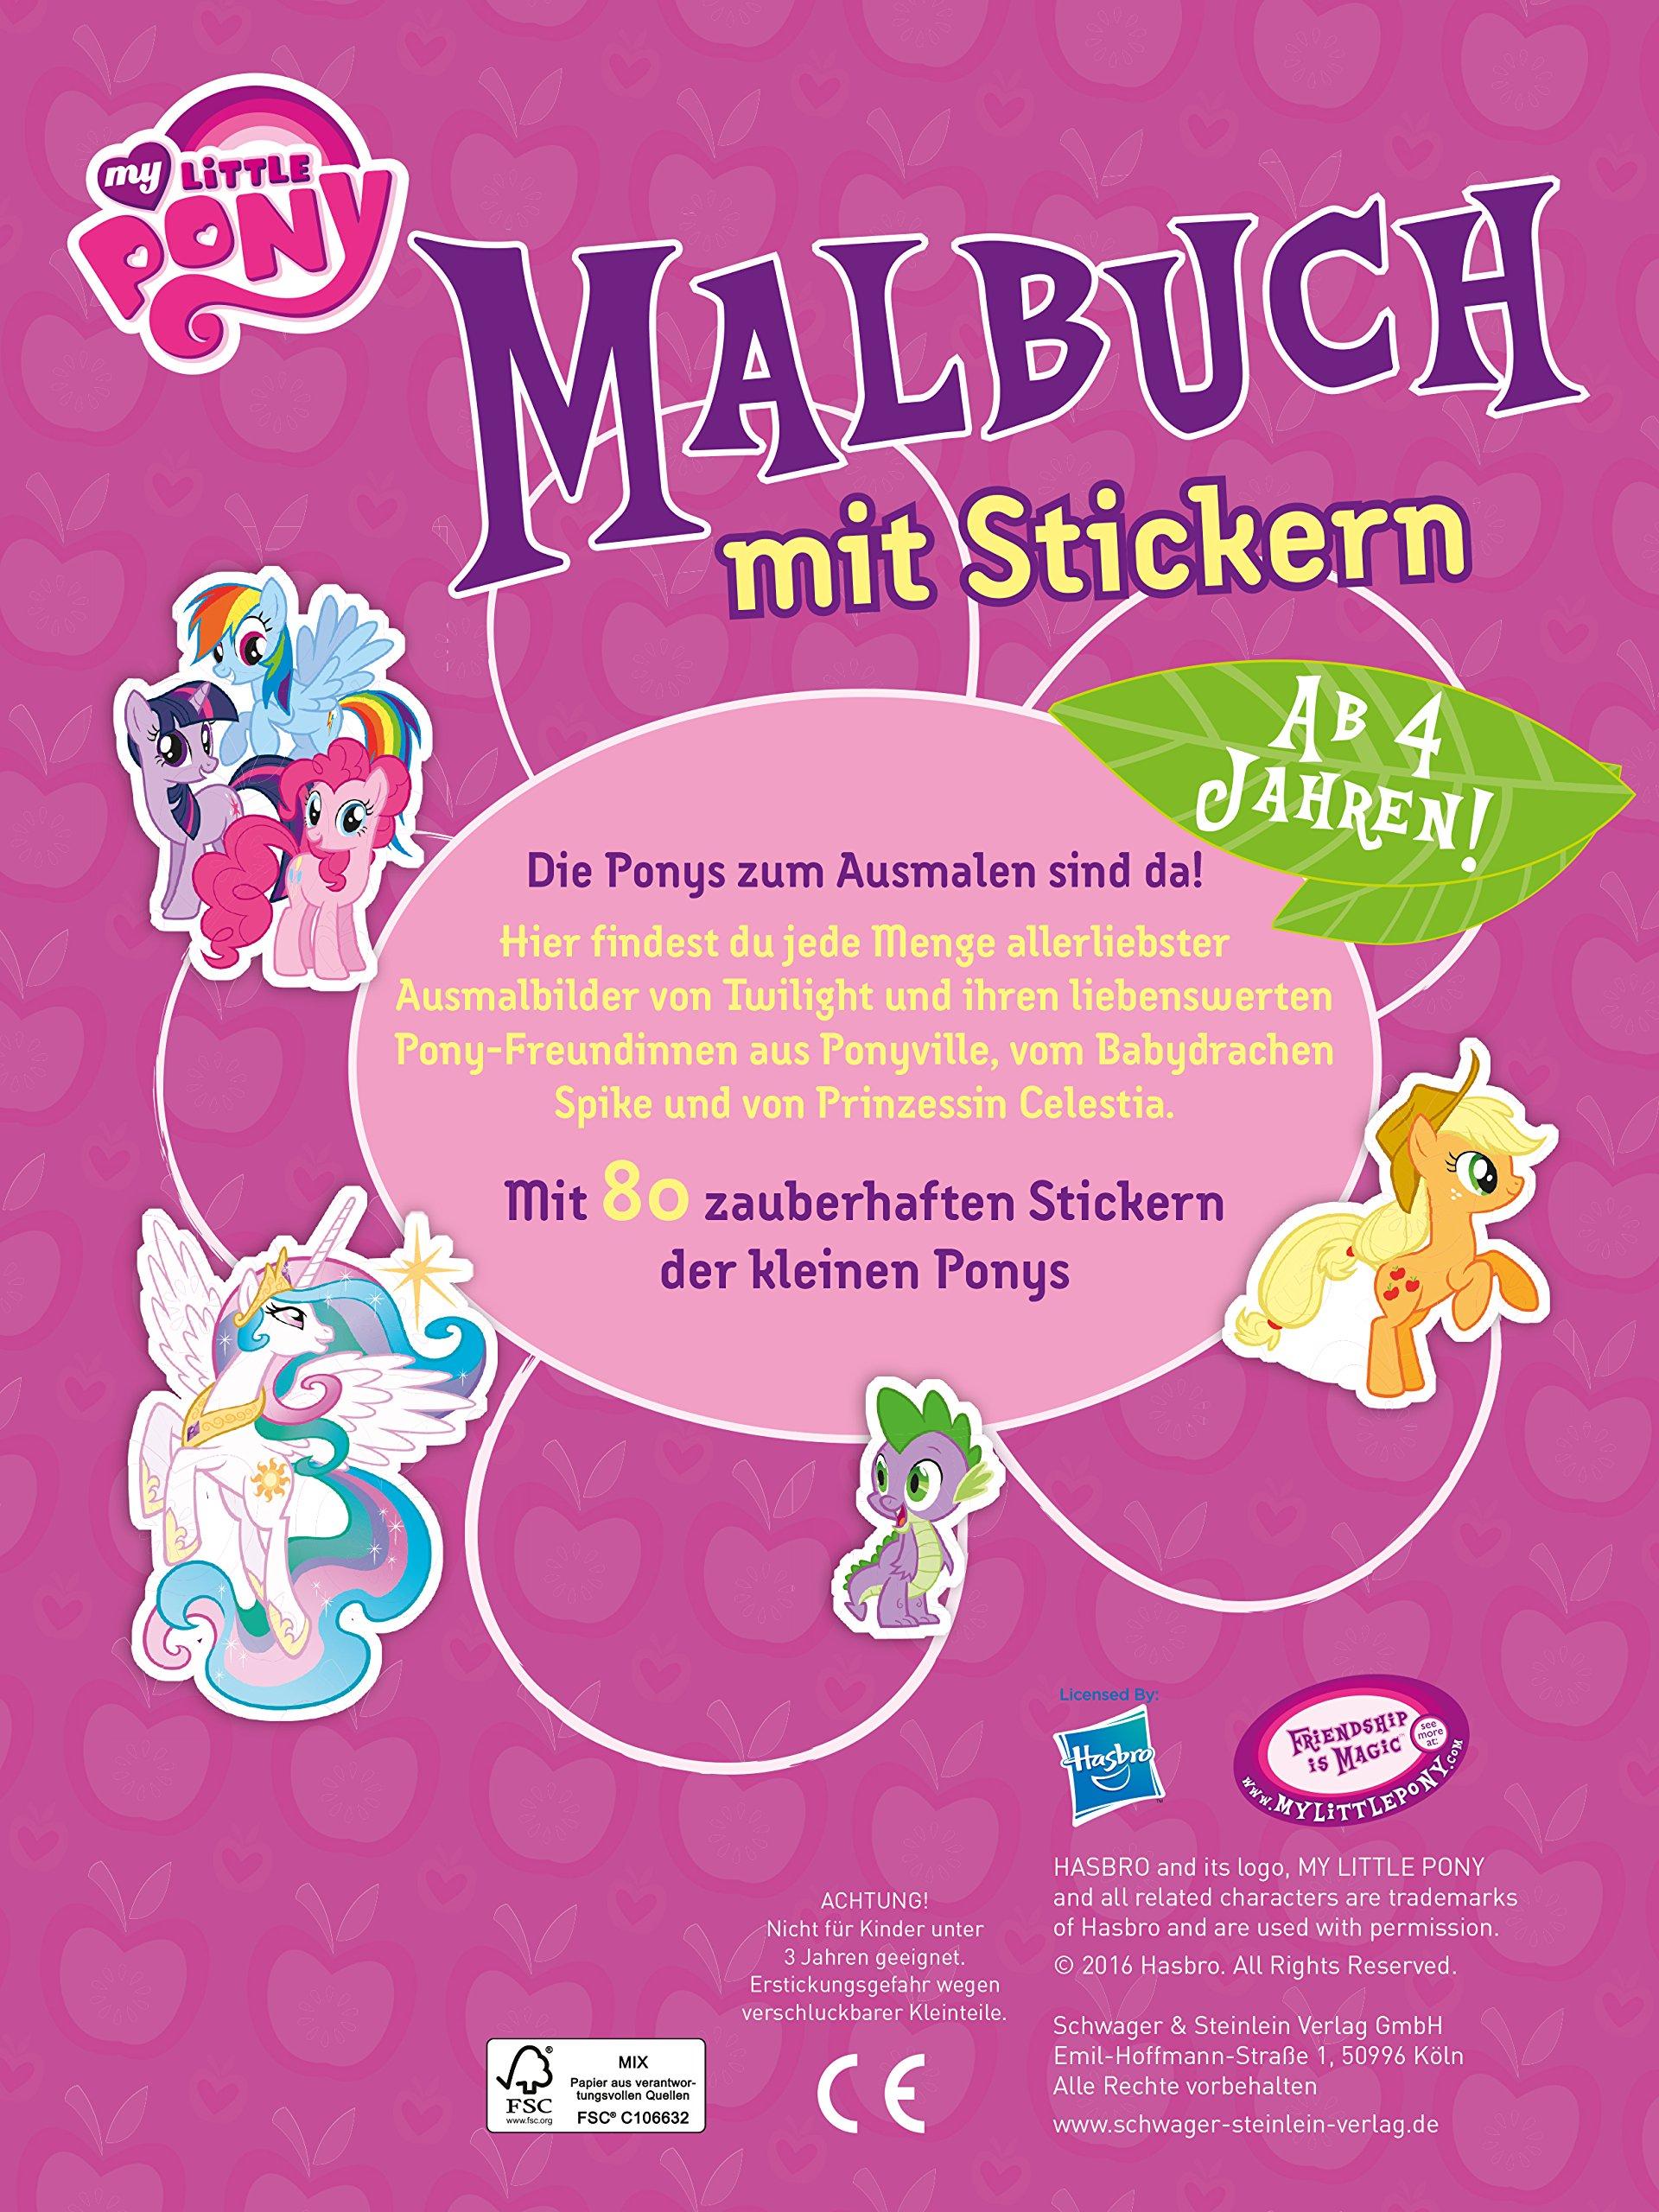 Malbuch My Little Pony Mit 80 Stickern Amazon Co Uk 9783849916503